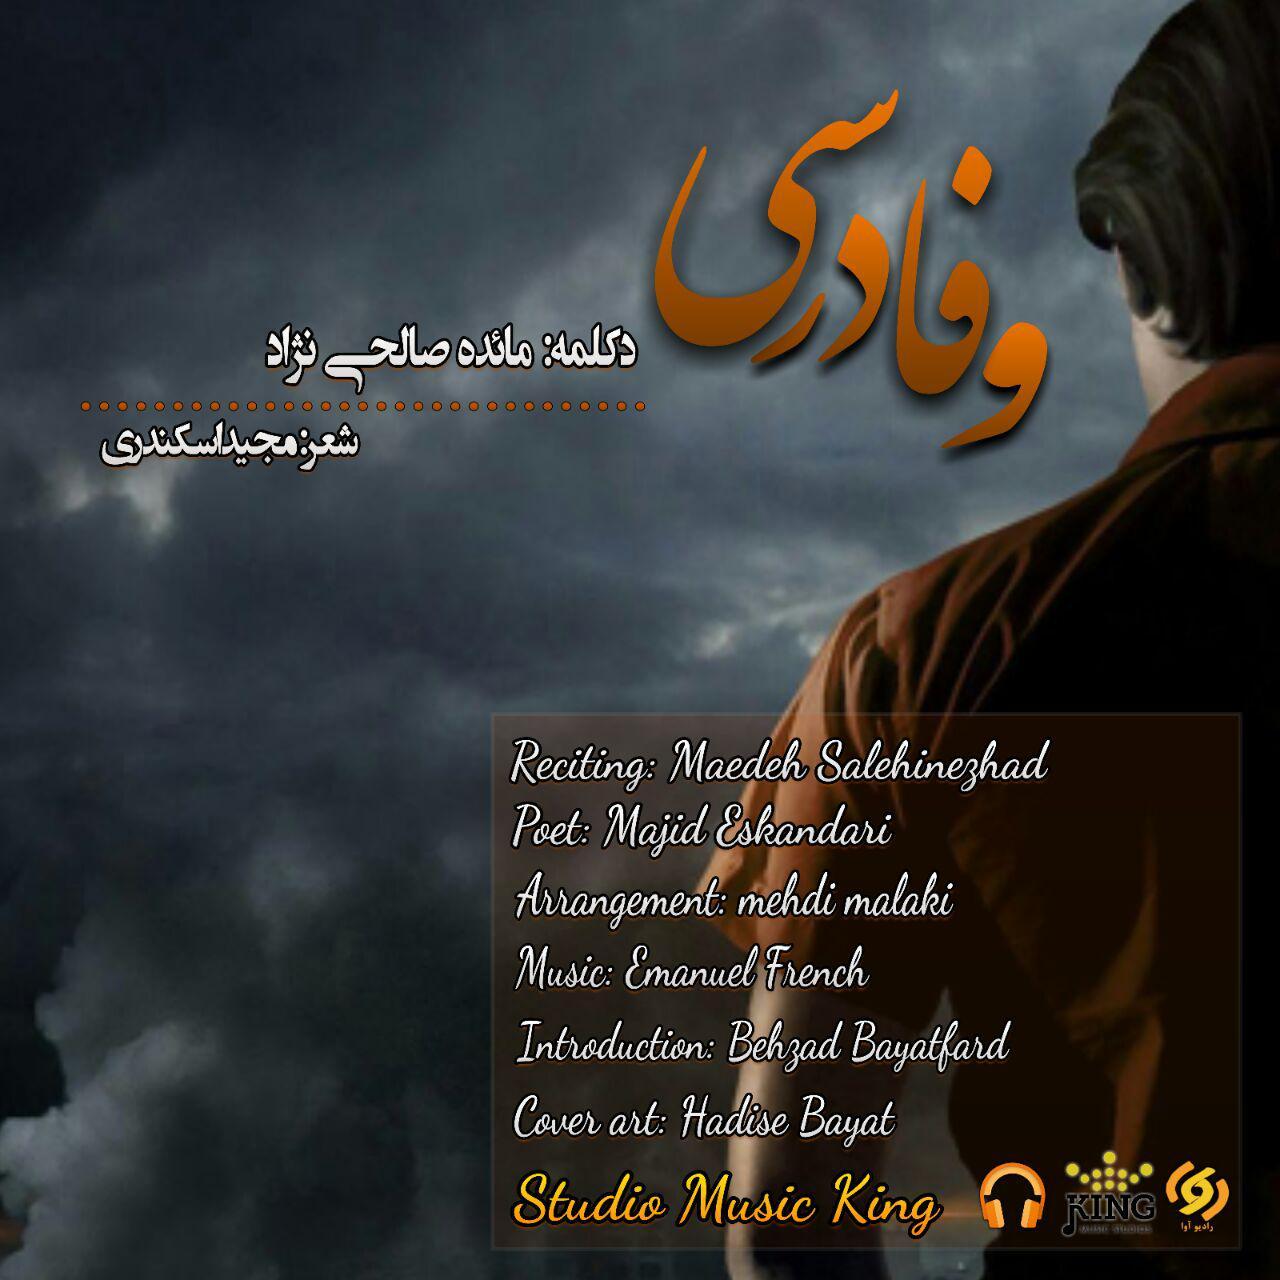 http://s9.picofile.com/file/8300925034/063Maedeh_Salehi_Nejhad_Vafa_Darsi.jpg